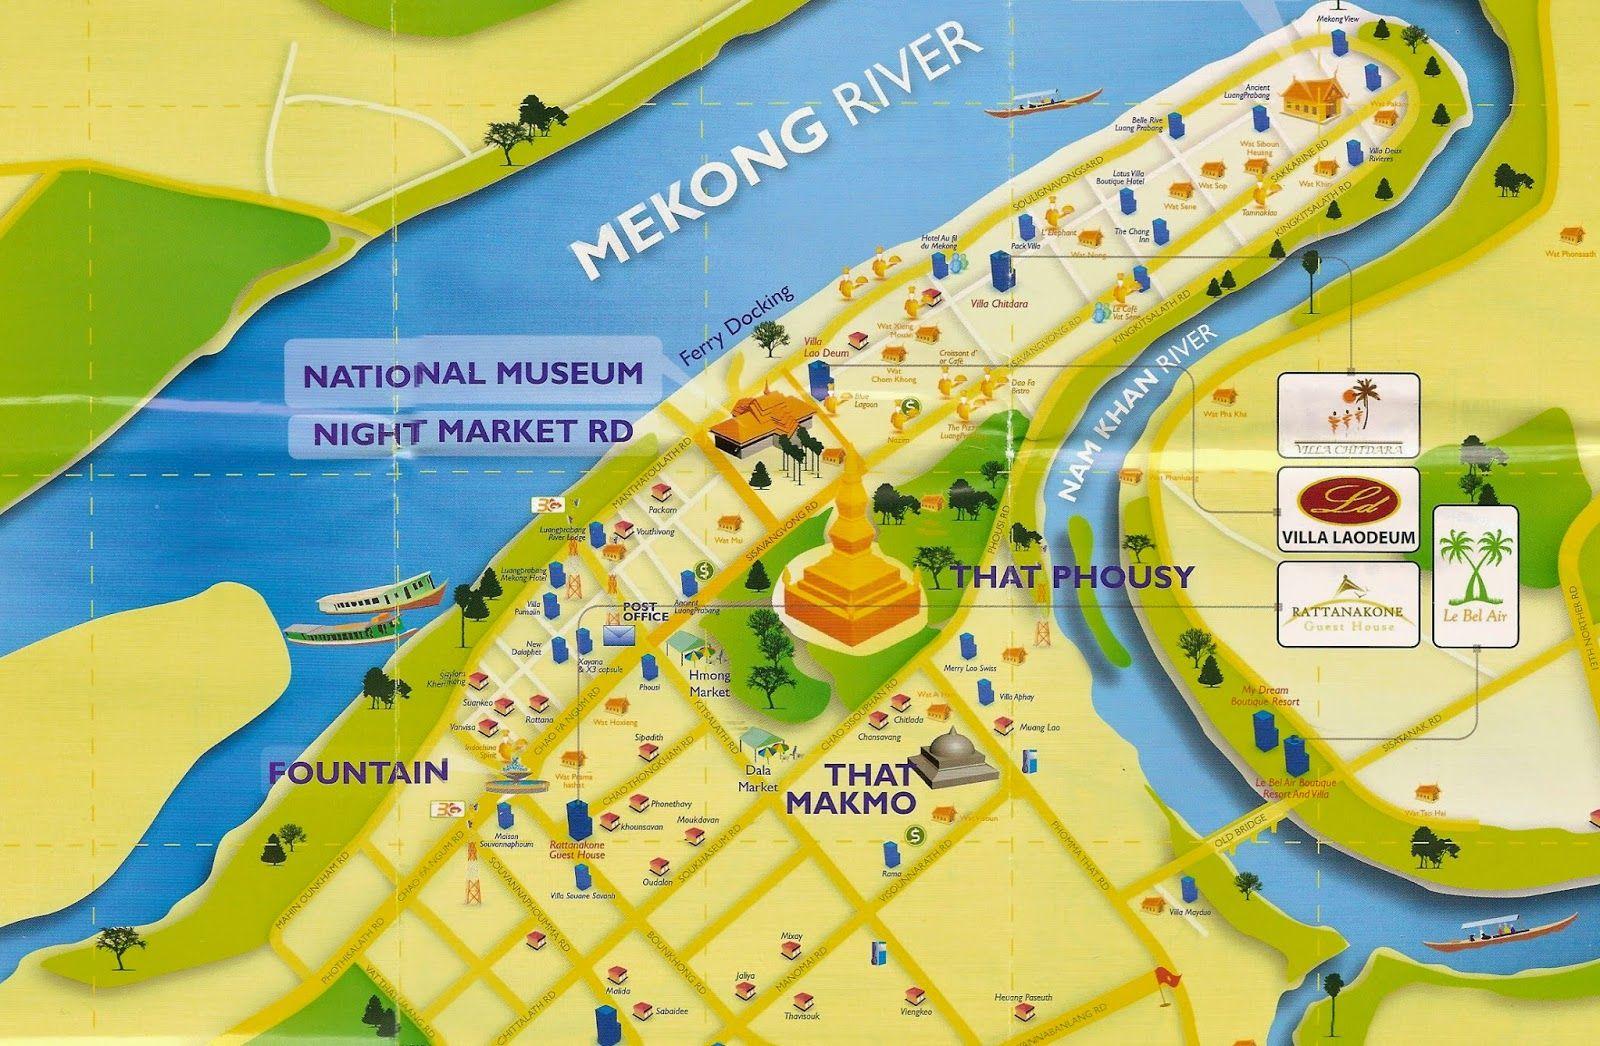 MapaturisticoLuangPrabangLaosjpg 16001046 for Thesis